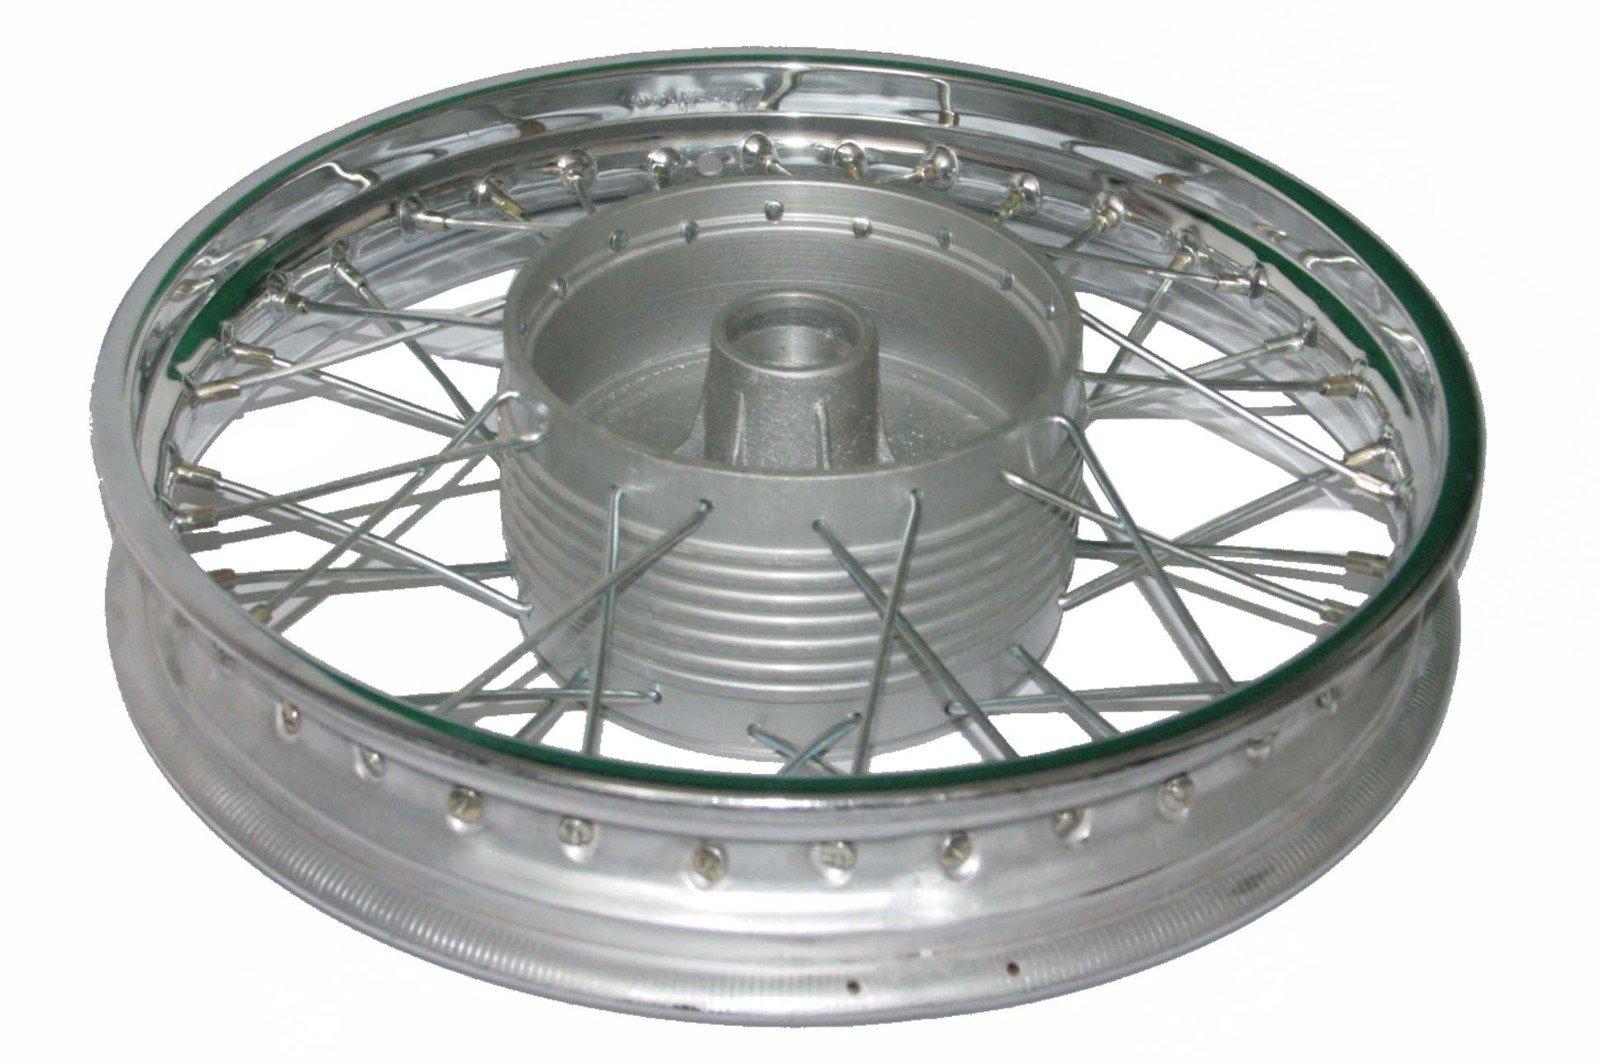 Enfield County Chrome Plated Complete 16'' Wm2 Jawa 250 350 Cw 36 Holes Wheel Rim + Spokes